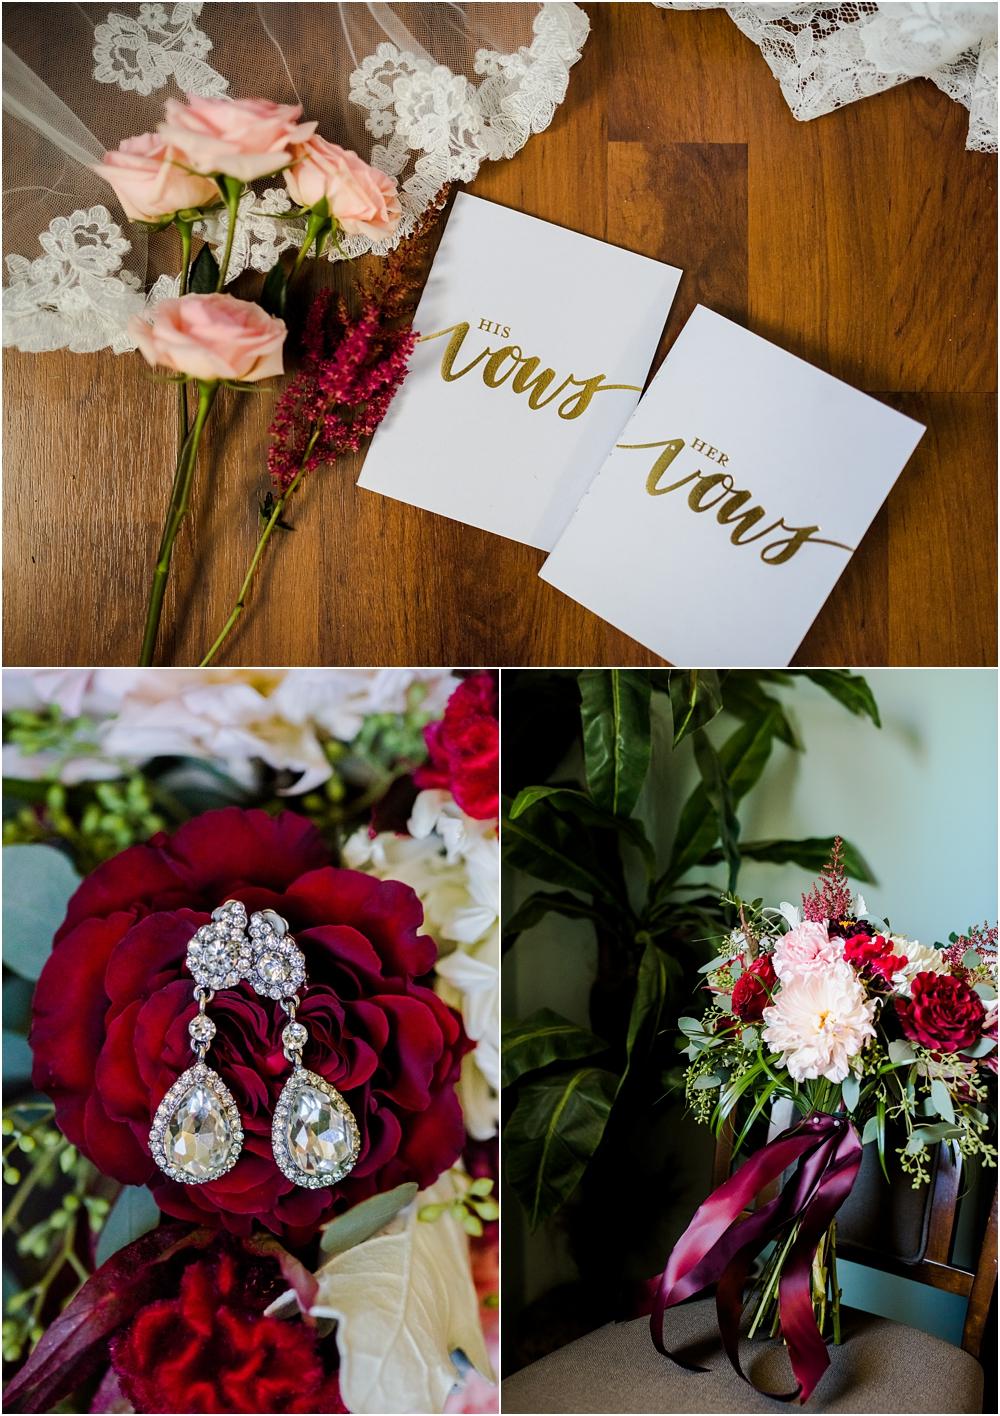 Eden-Gardens-florida-wedding-photographer-kiersten-stevenson-photography-5.jpg